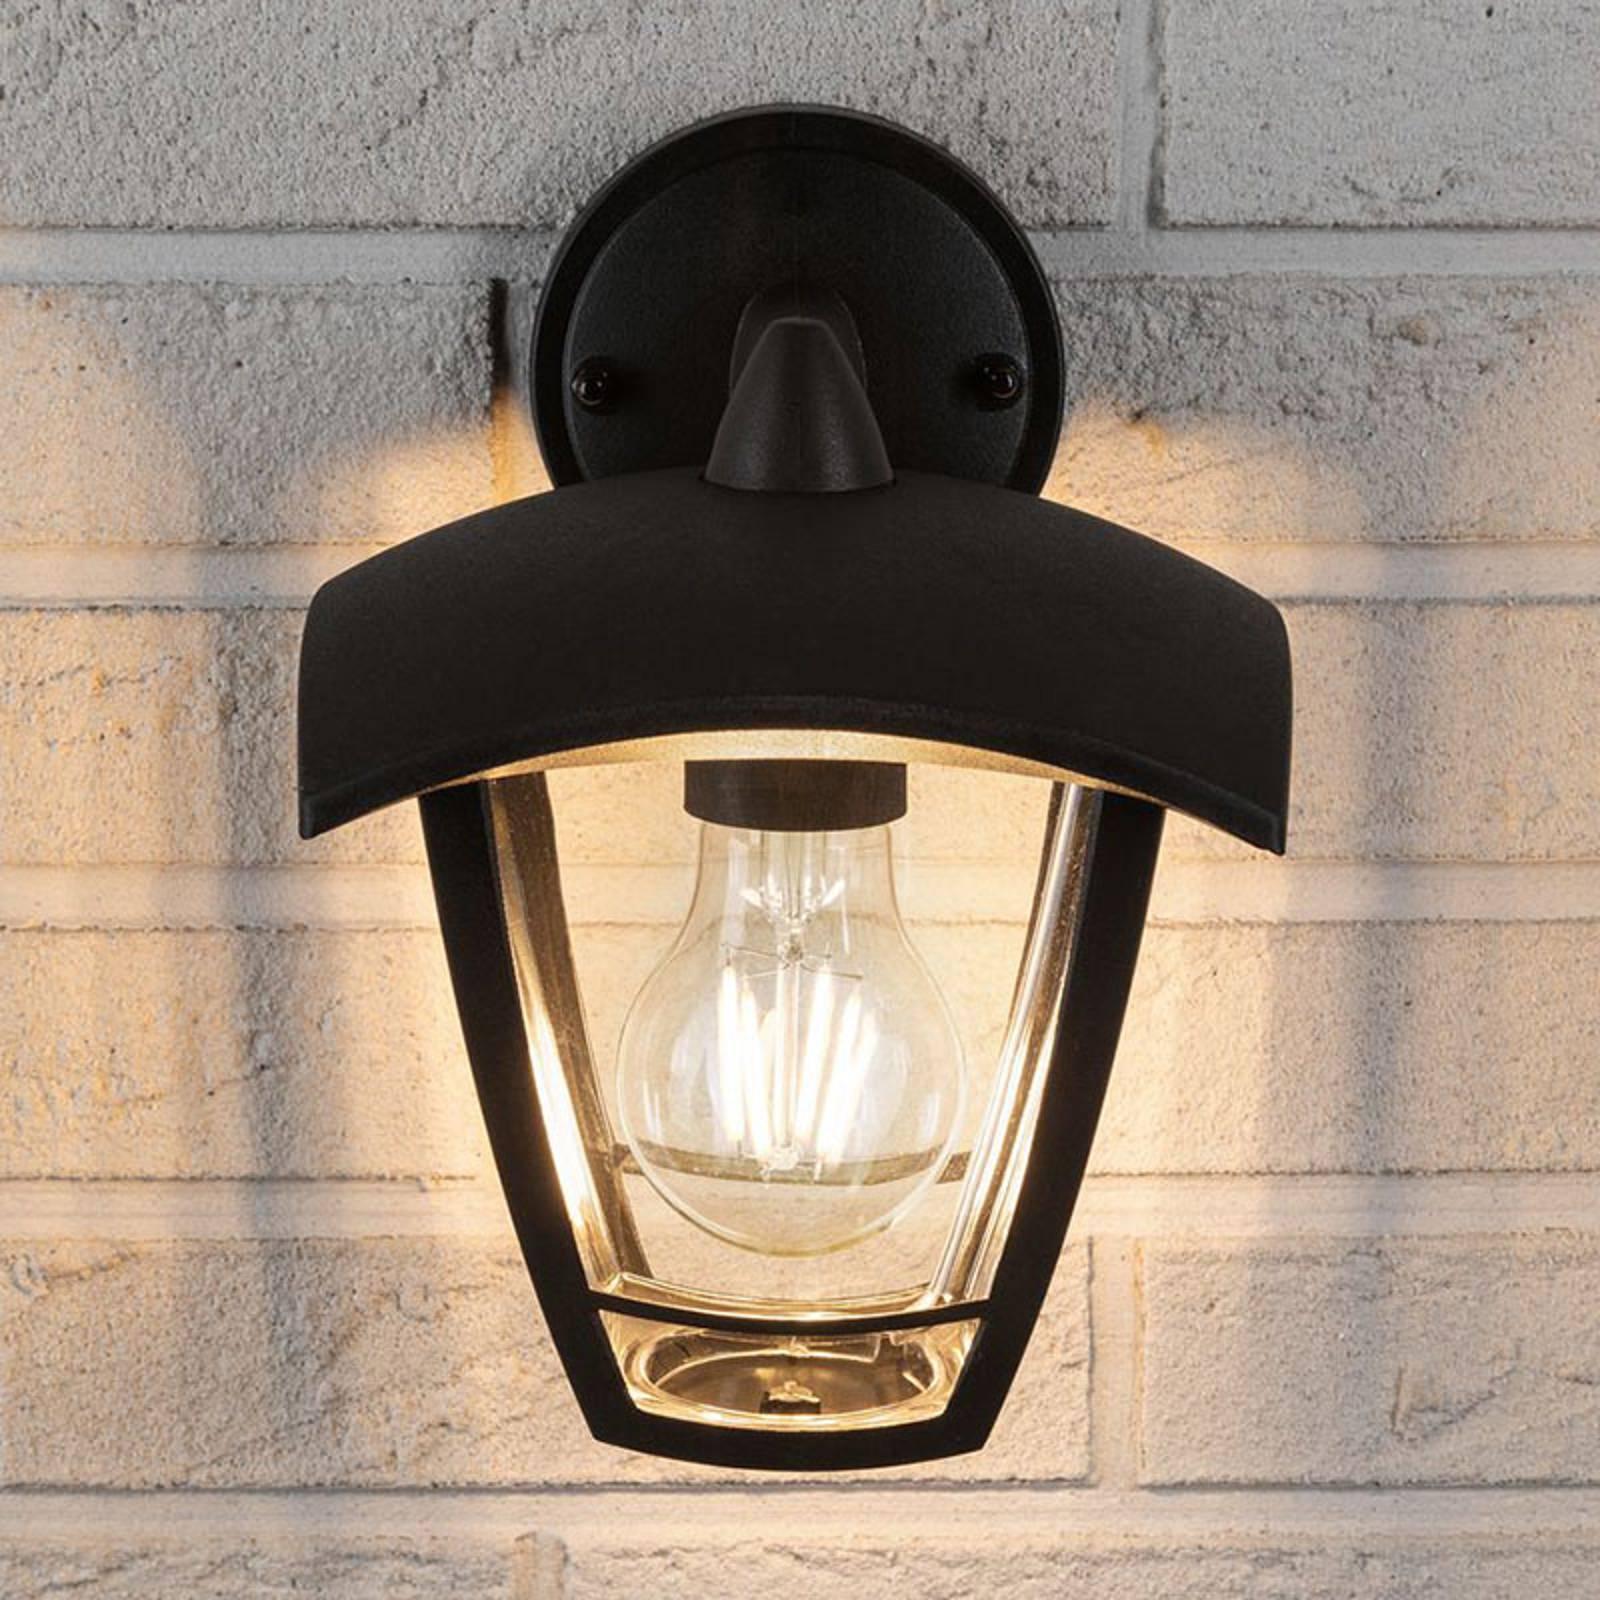 Paulmann Classic curved buitenwandlamp, onder